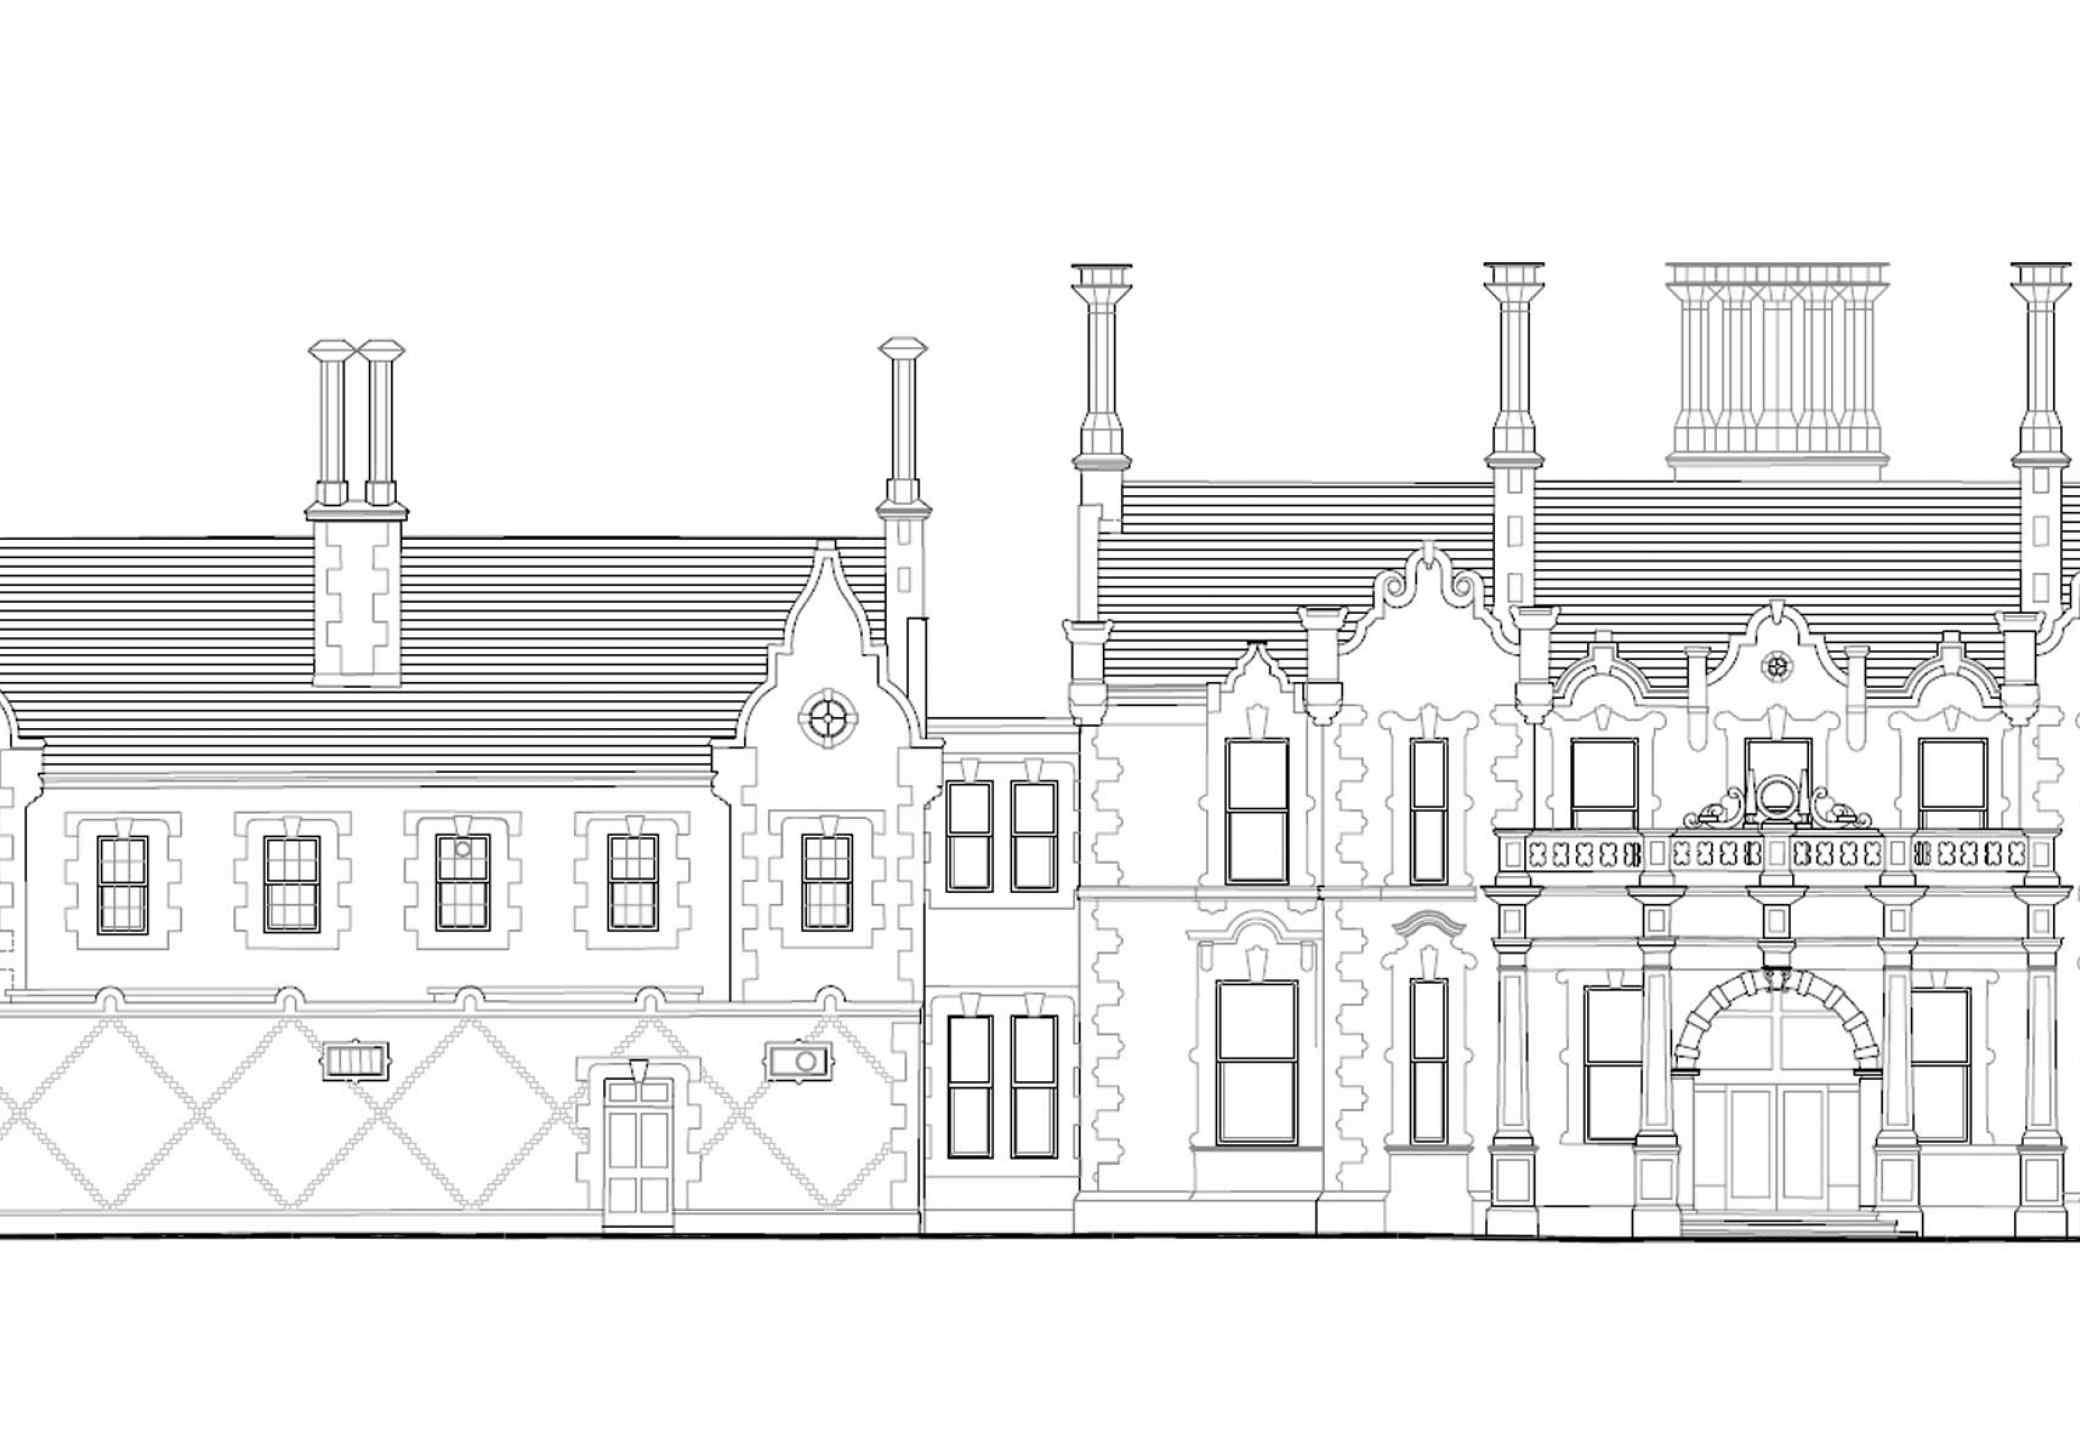 Backford Hall rear elevation drawing